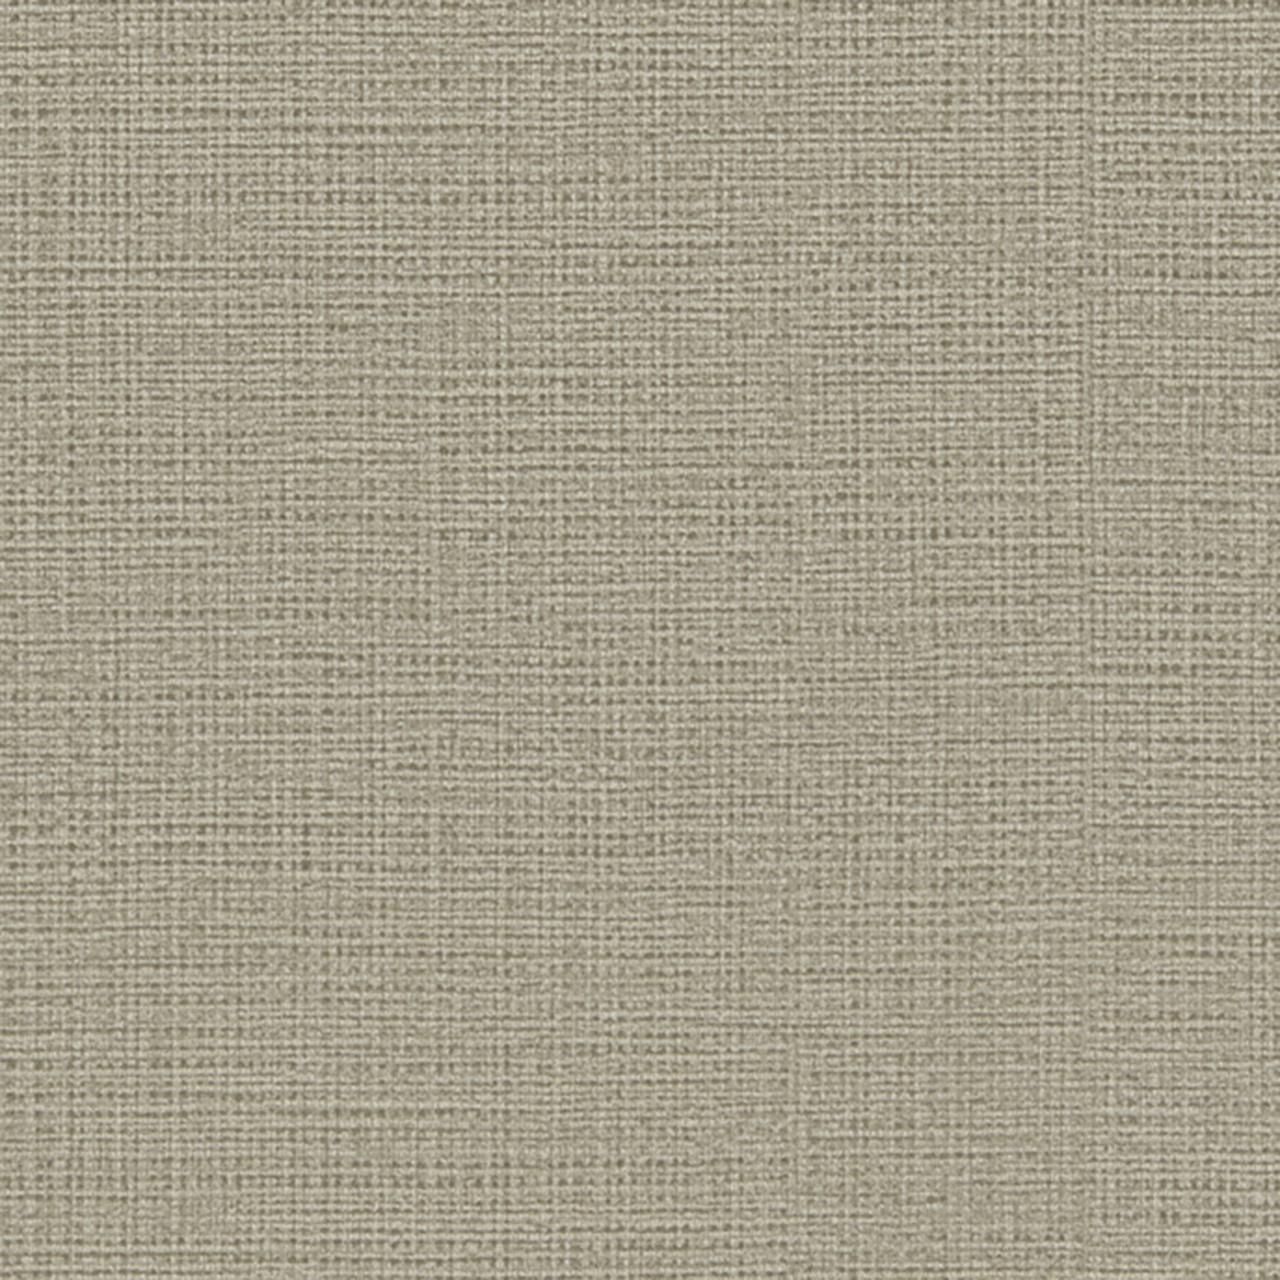 Contemporary Beyond Basics Cotton Texture Olive Fog Wallpaper 420